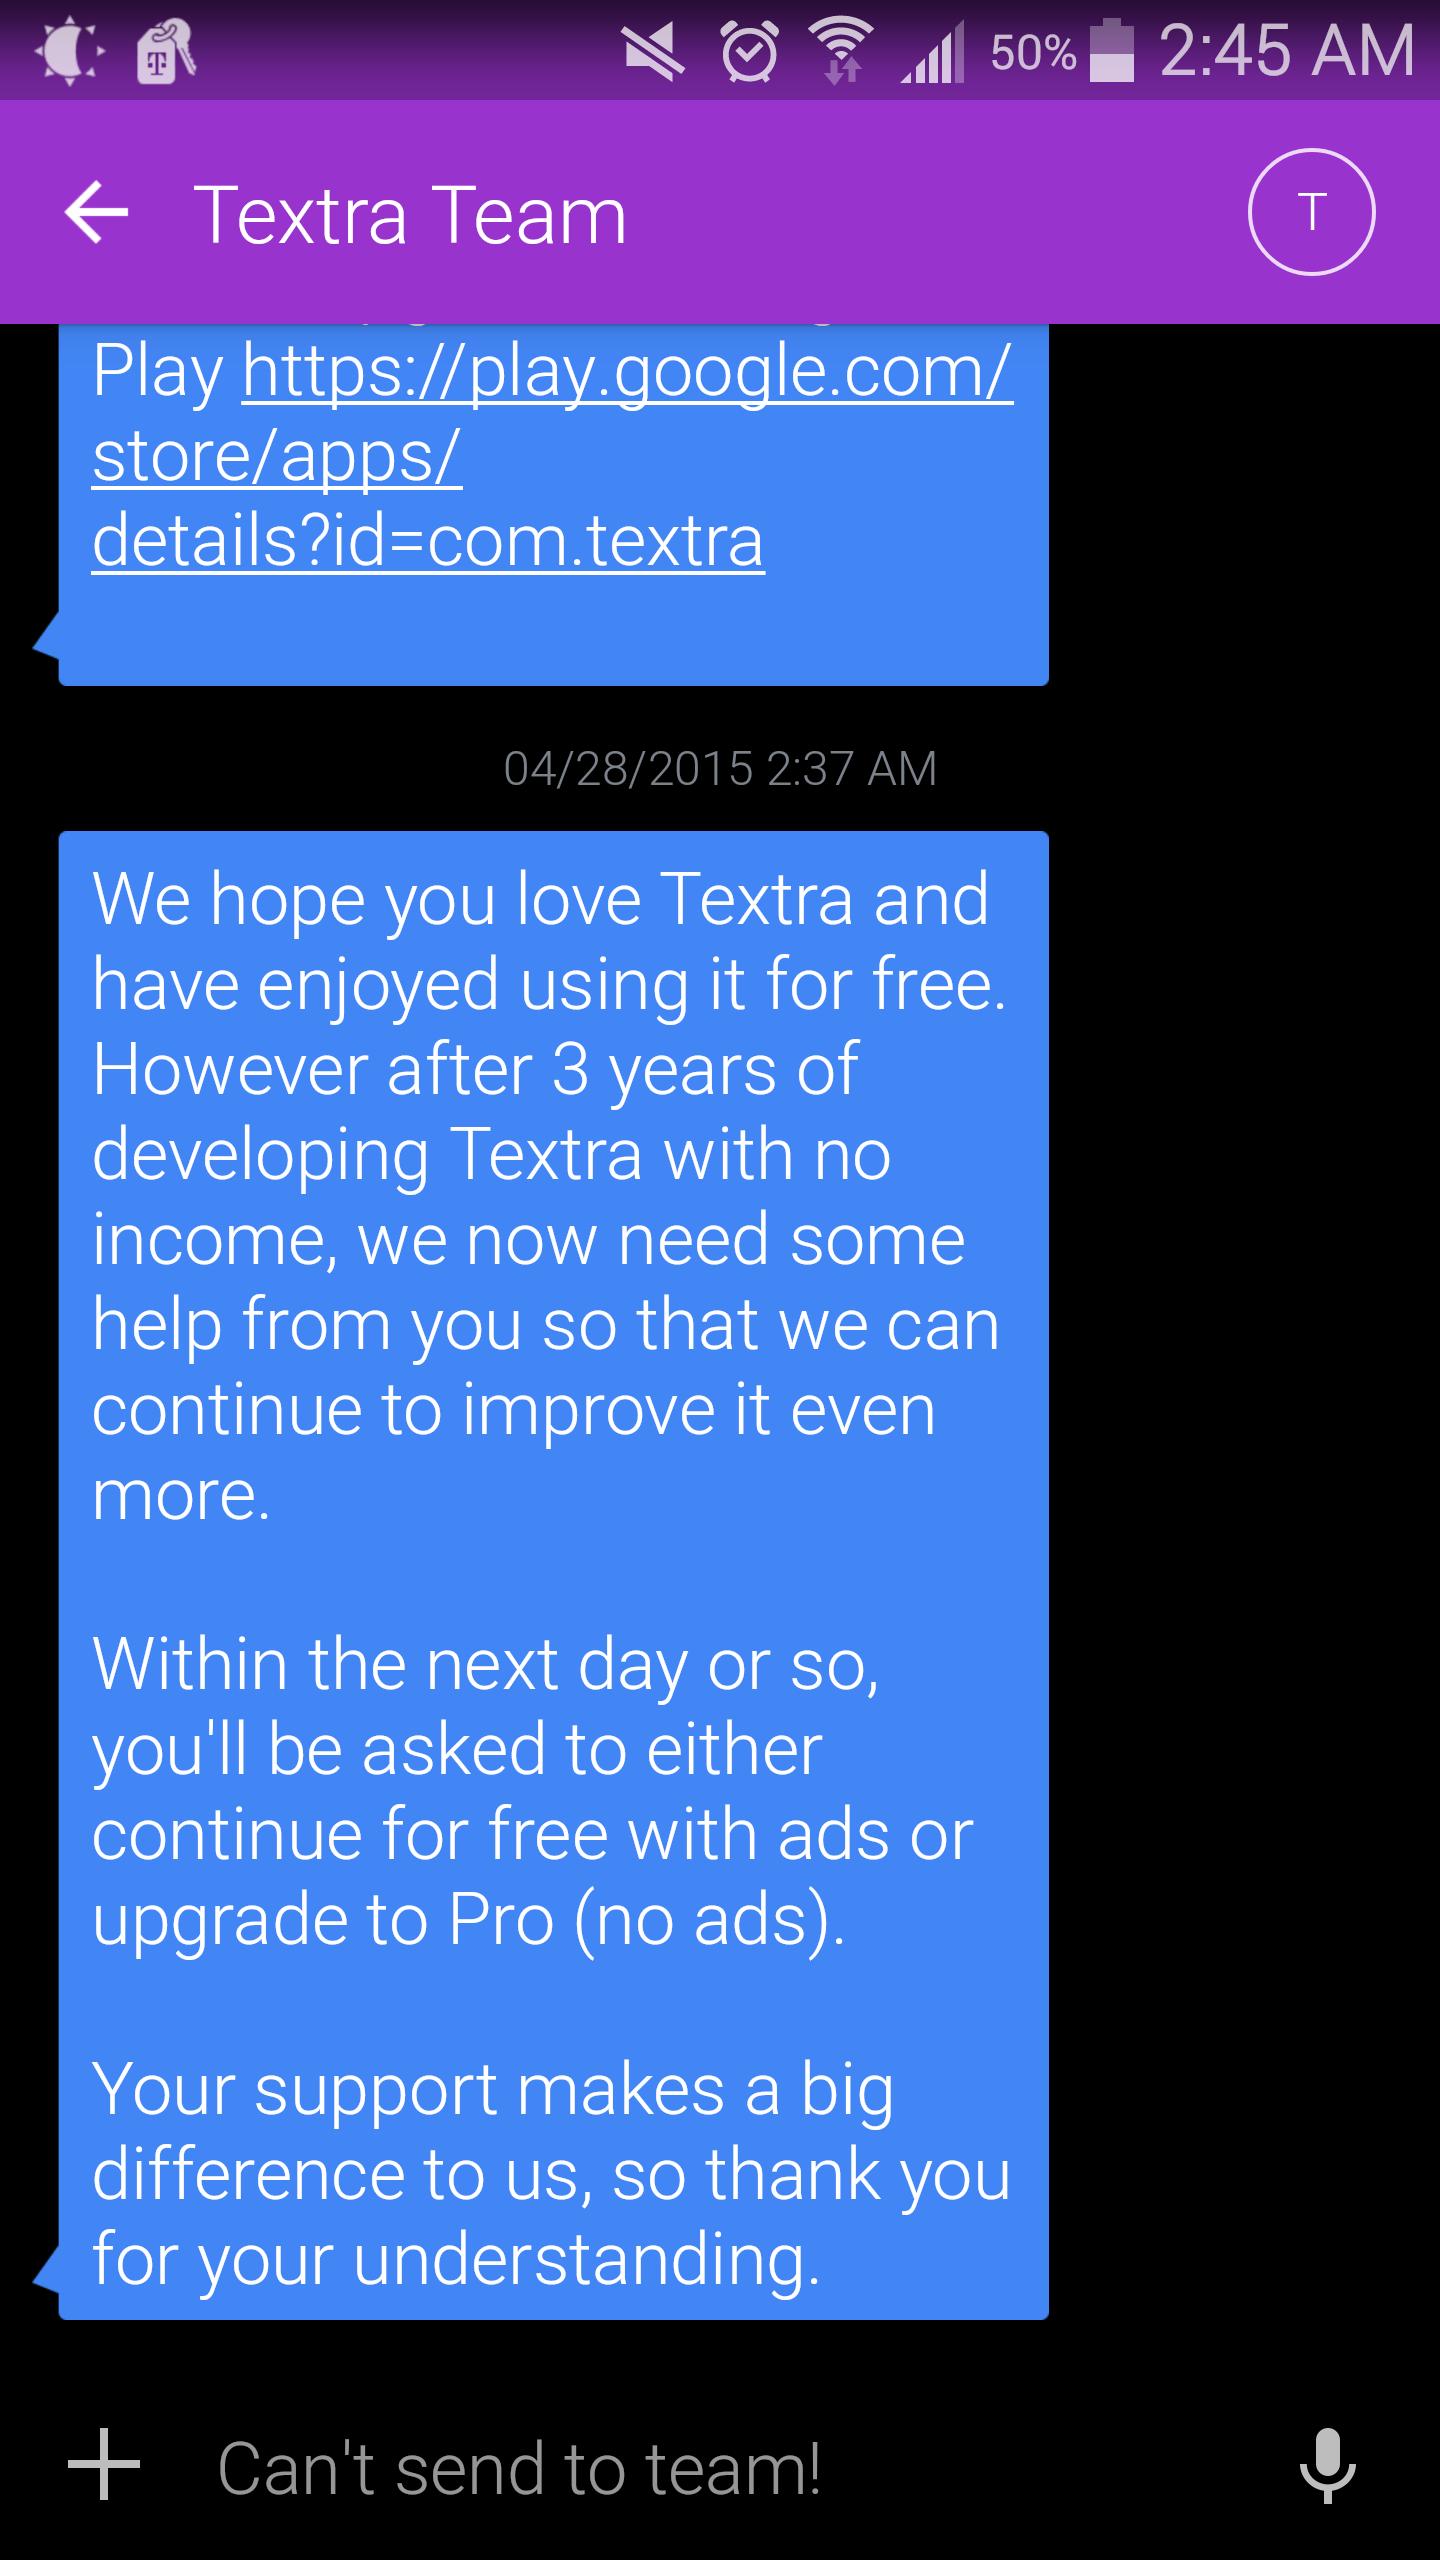 Textra SMS gratuit, c'est fini